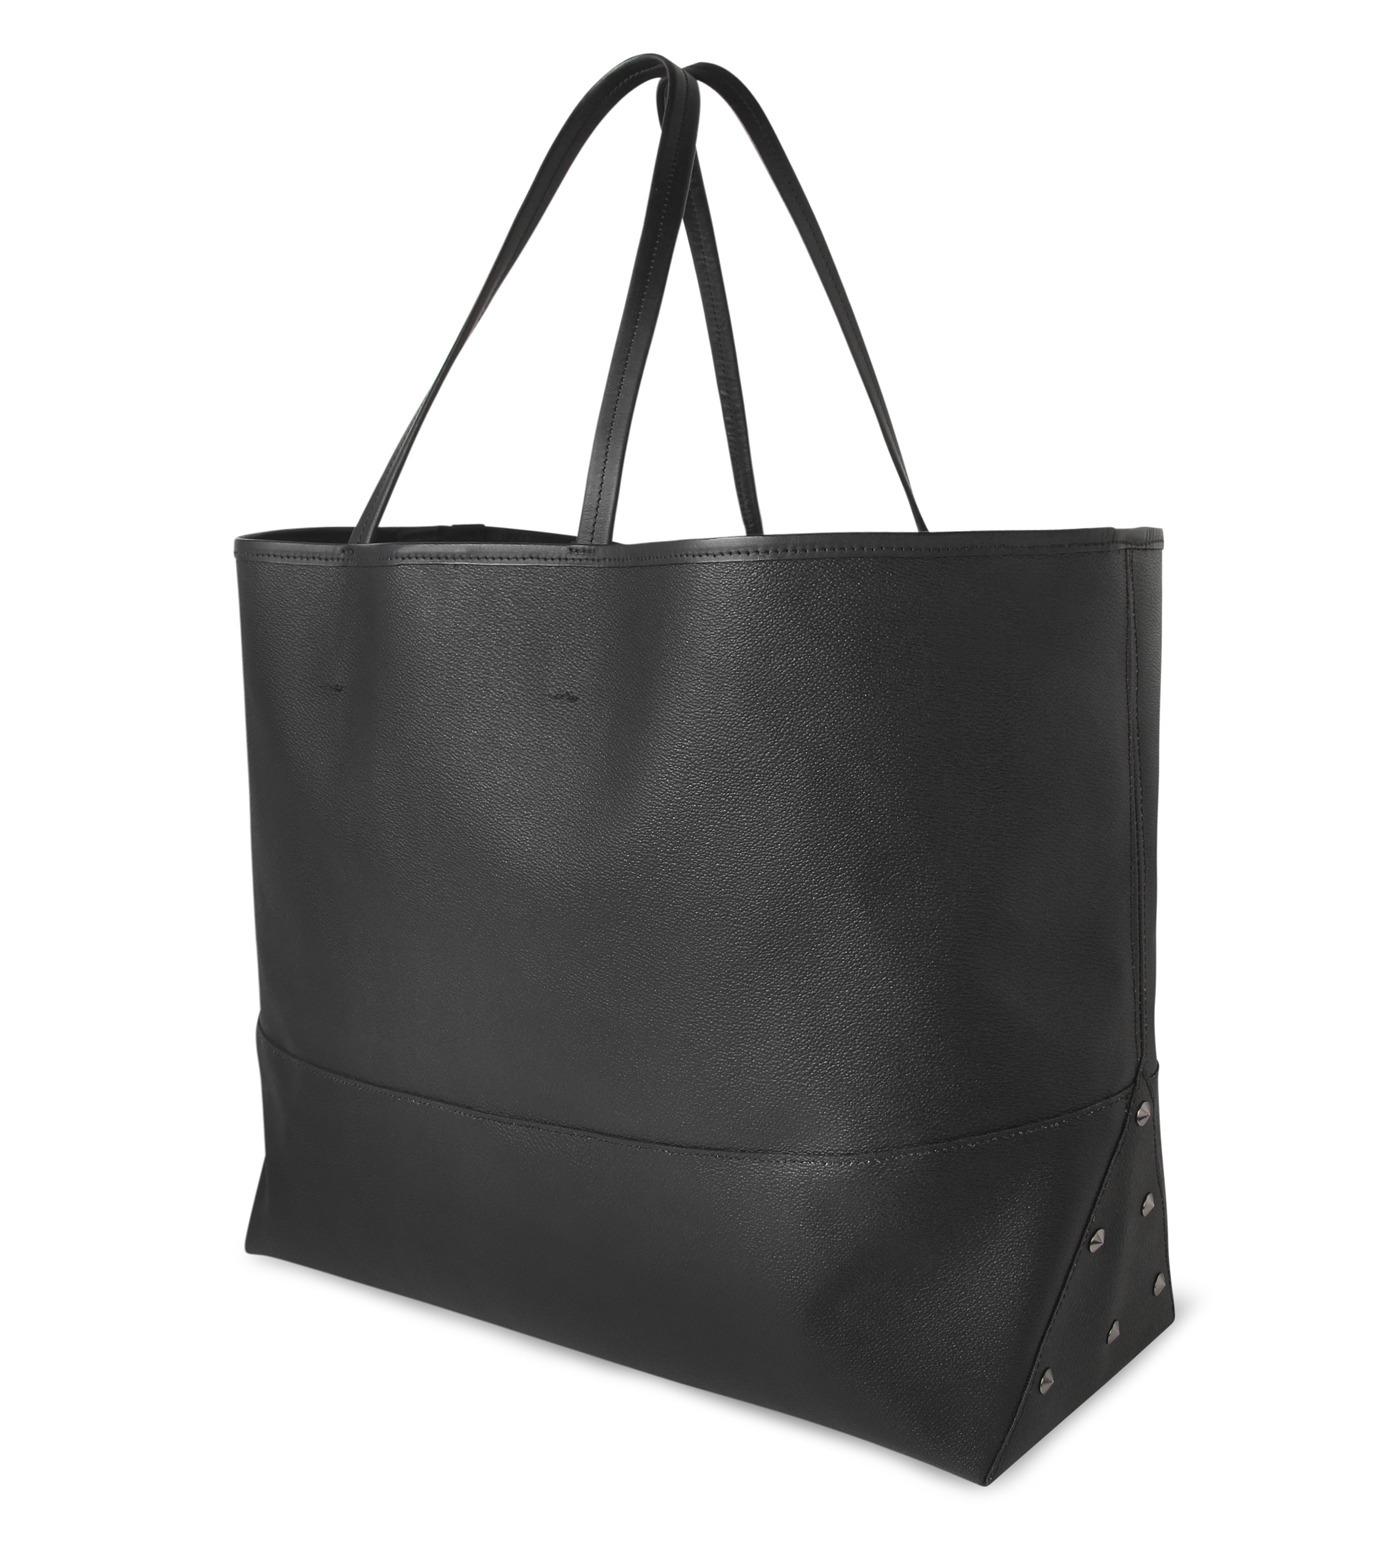 HL HEDDIE LOVU(エイチエル・エディールーヴ)のBIG TOTE BAG-BLACK(バッグ/bag)-17A90004-13 拡大詳細画像5